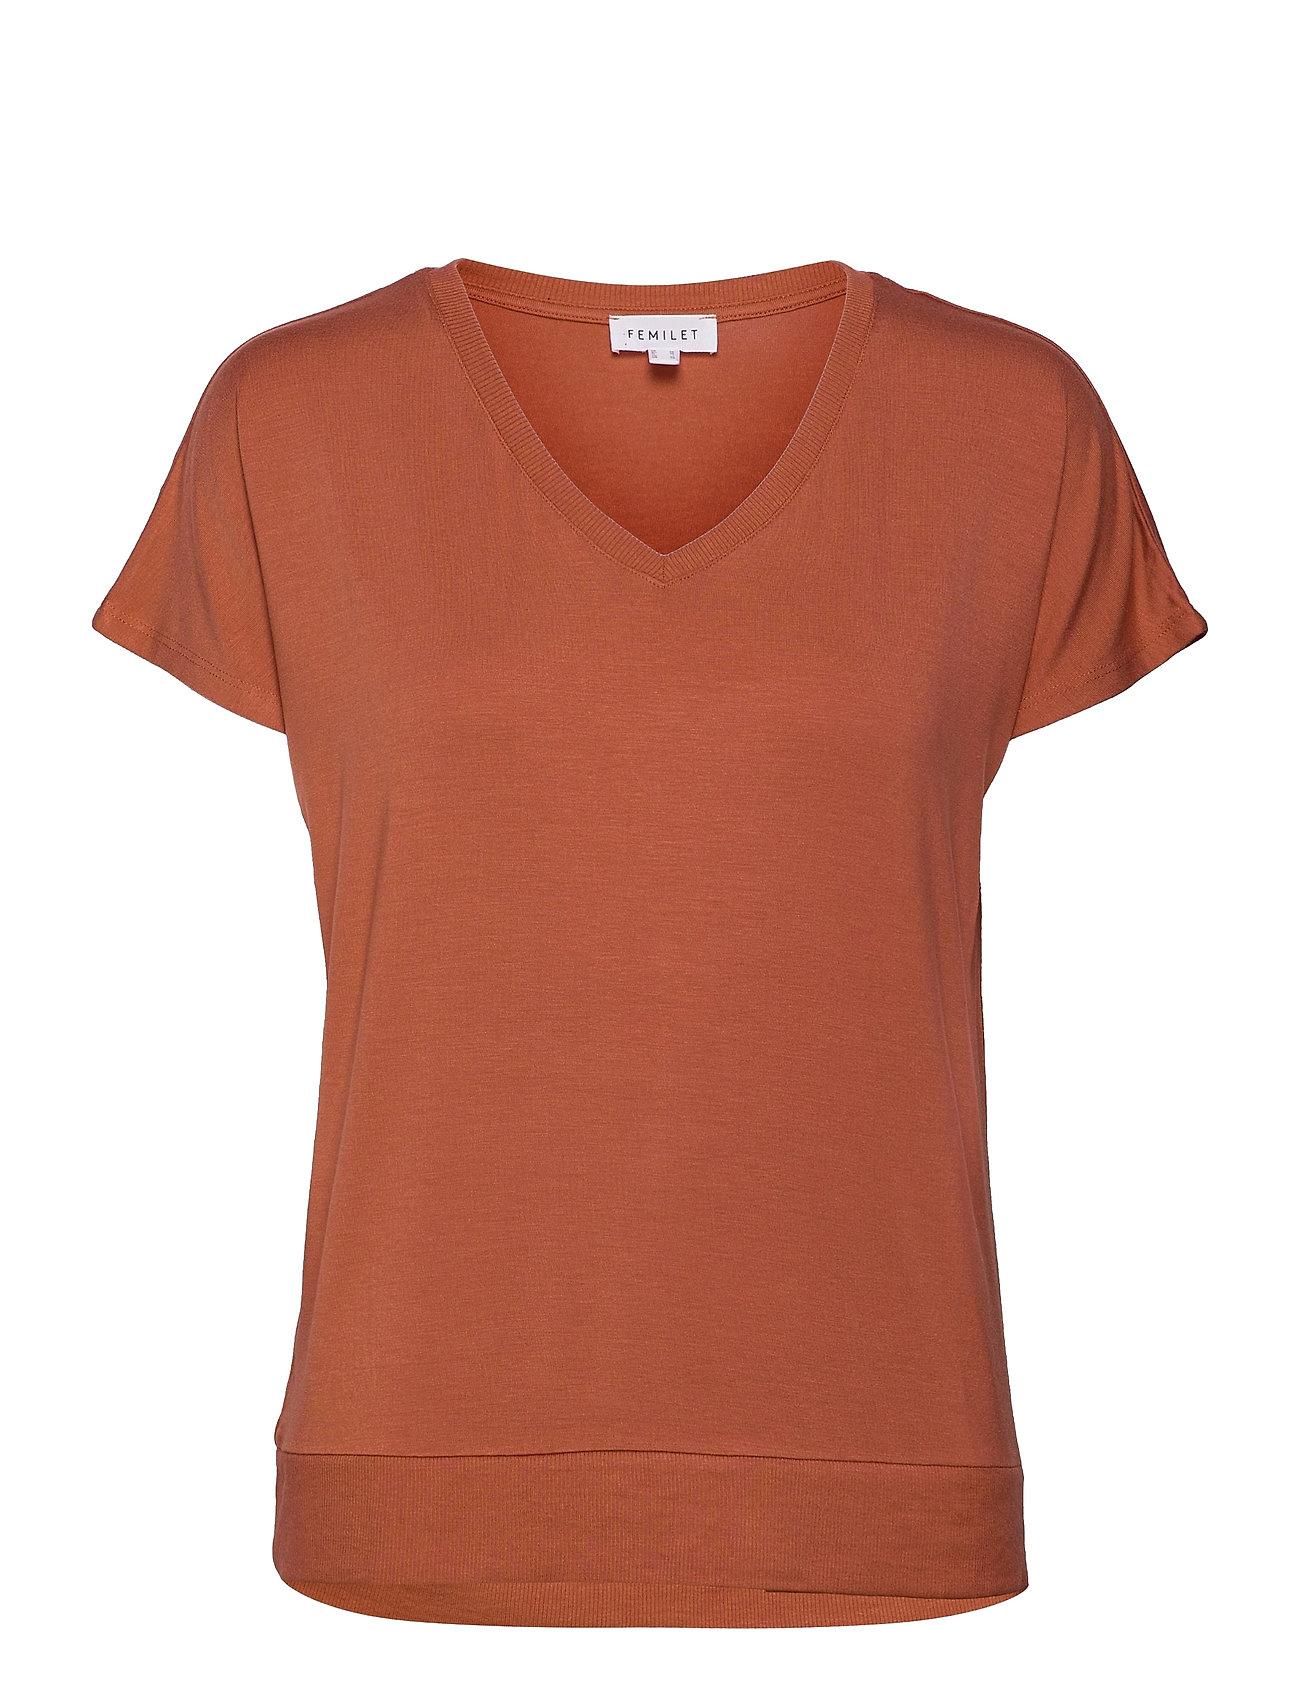 Lois T-Shirt T-shirt Top Lyserød Femilet